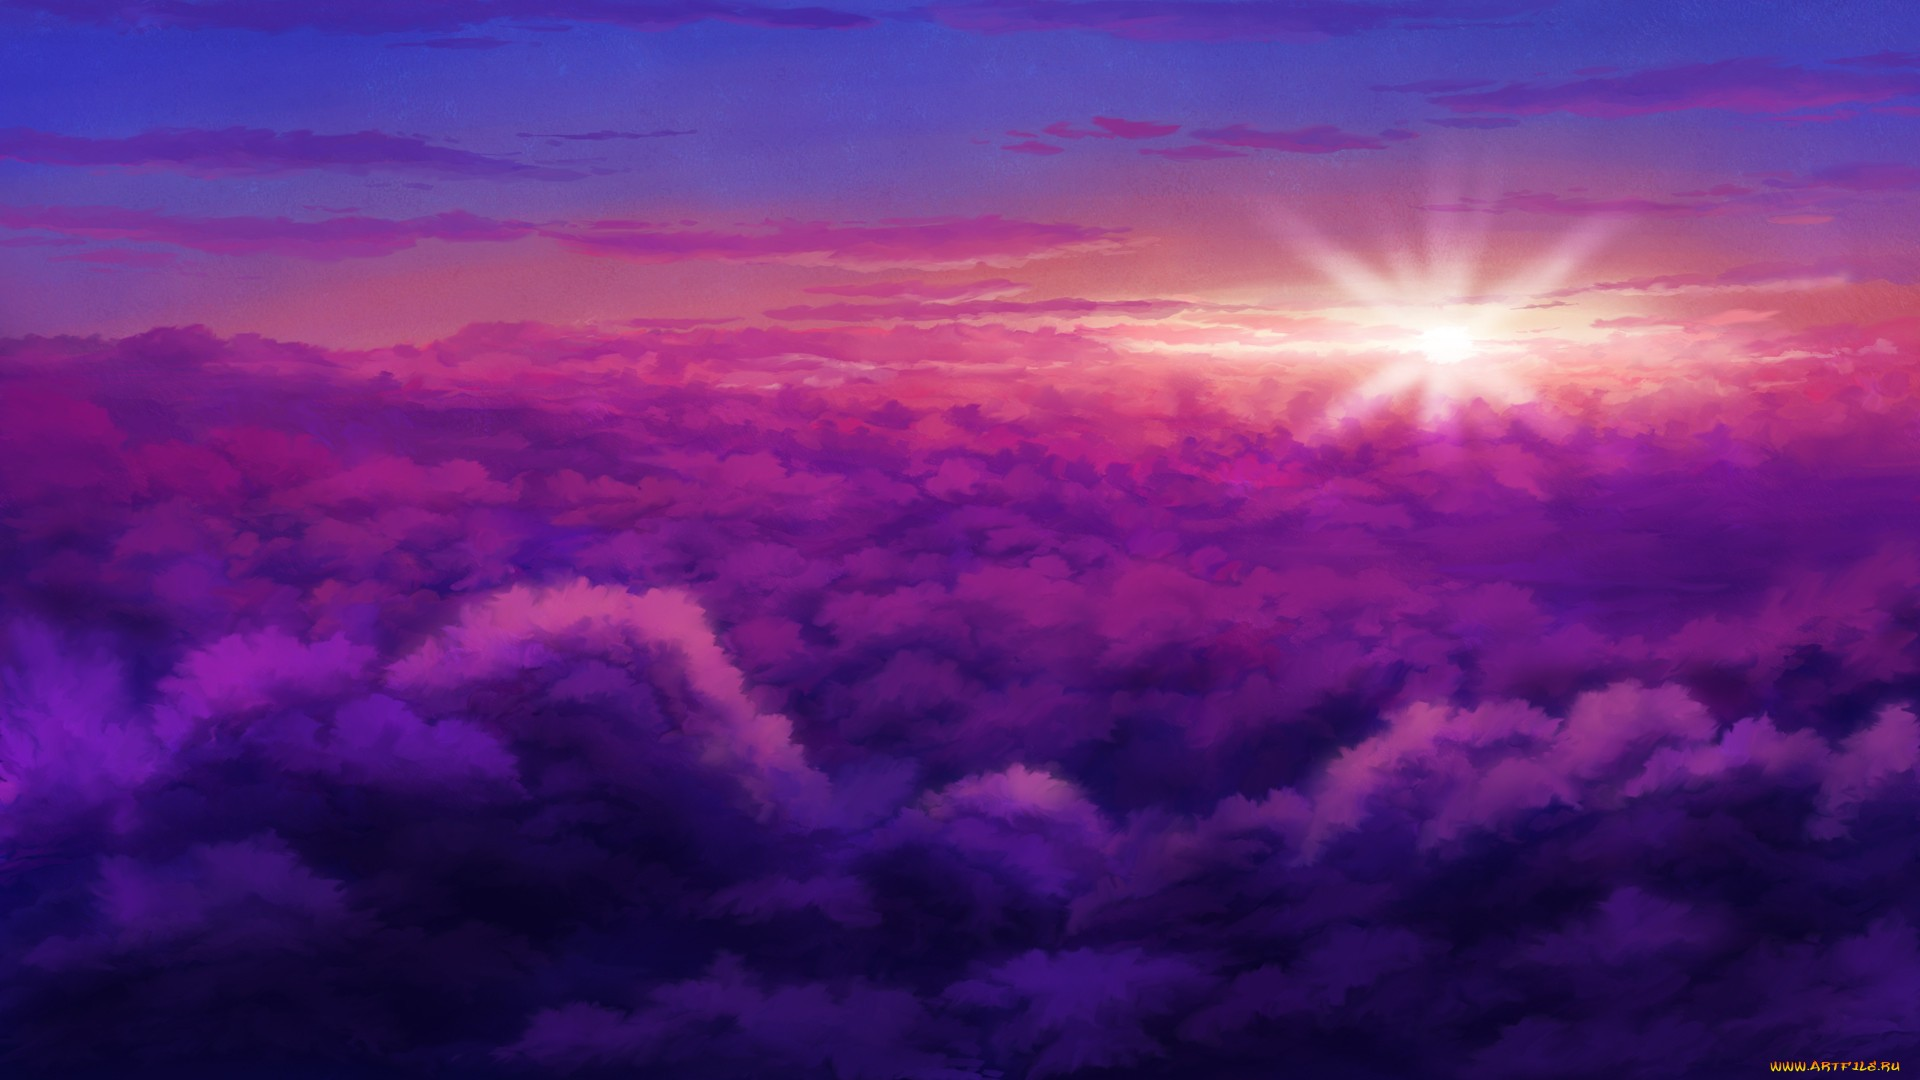 Anime Cloud Wallpaper Image